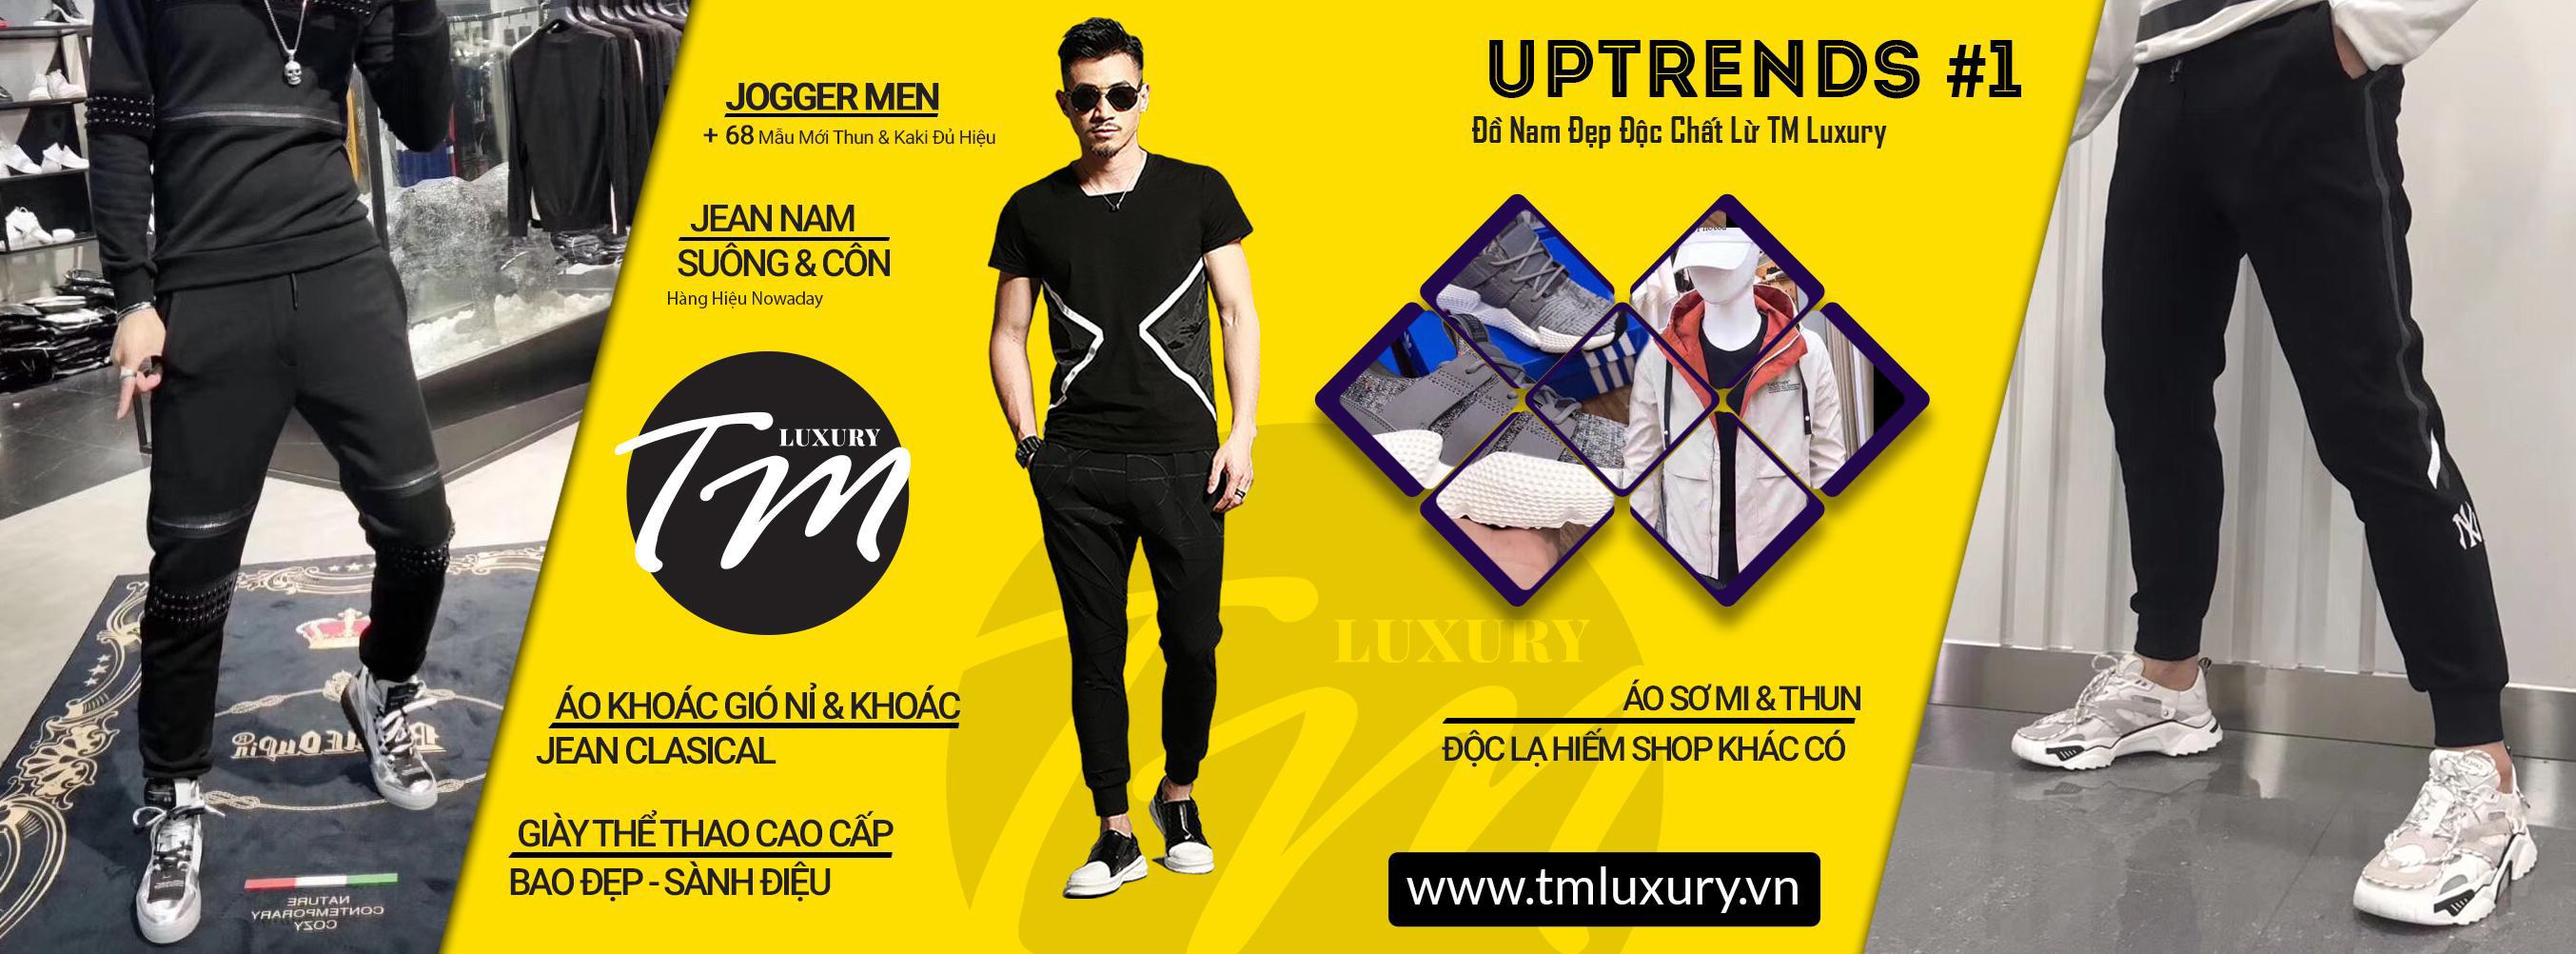 Banner shop thời trang nam tphcm tmluxury